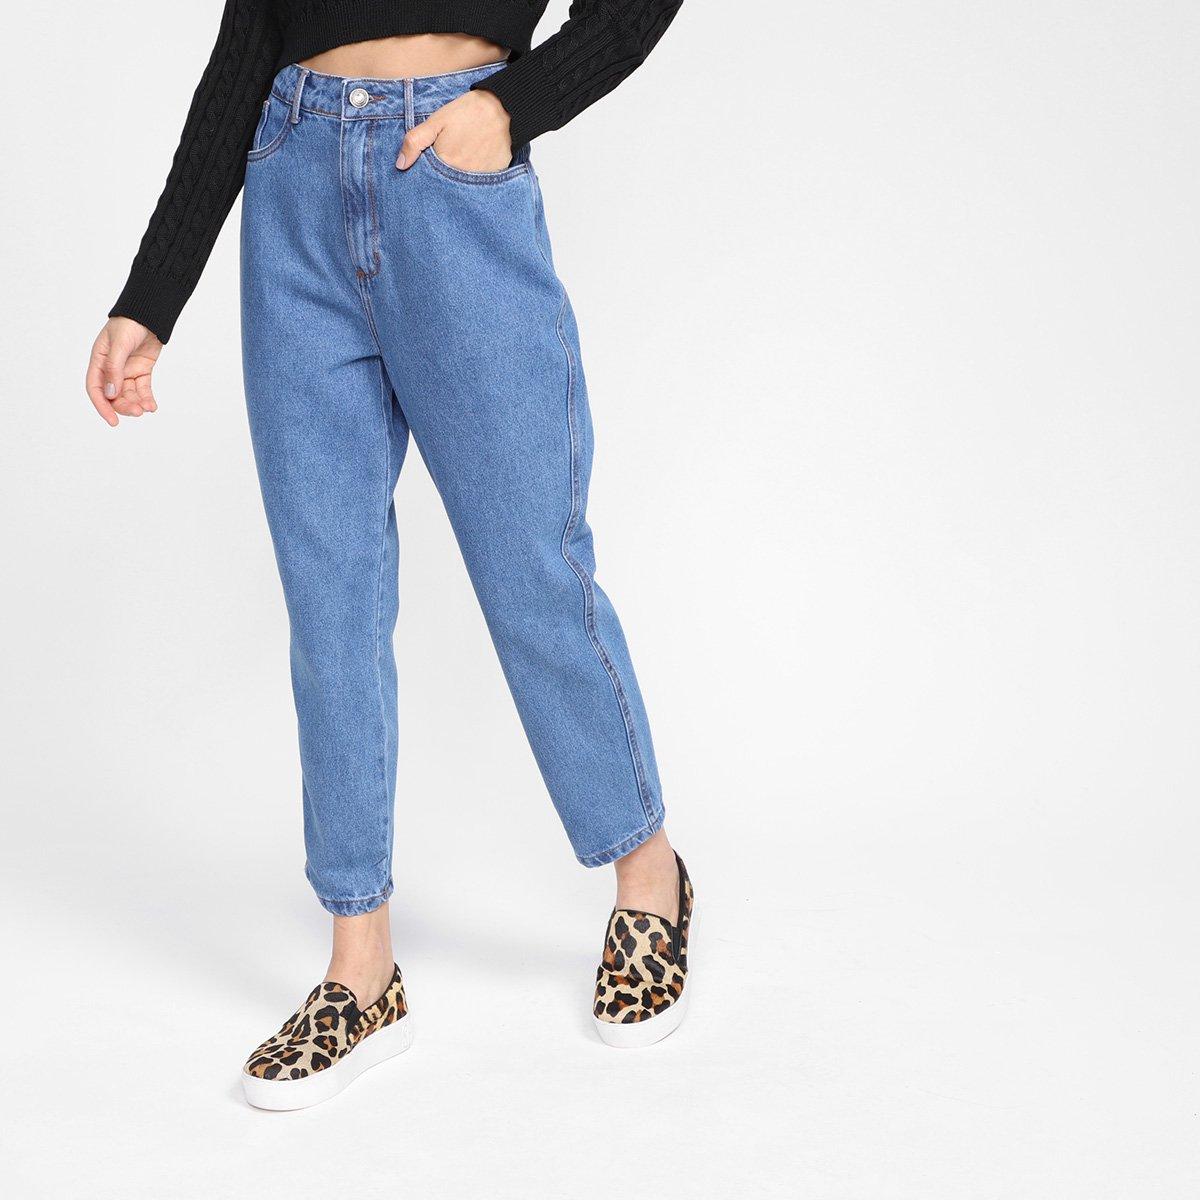 Calça Jeans My Favorite Things Mom Cintura Alta Feminino - Azul